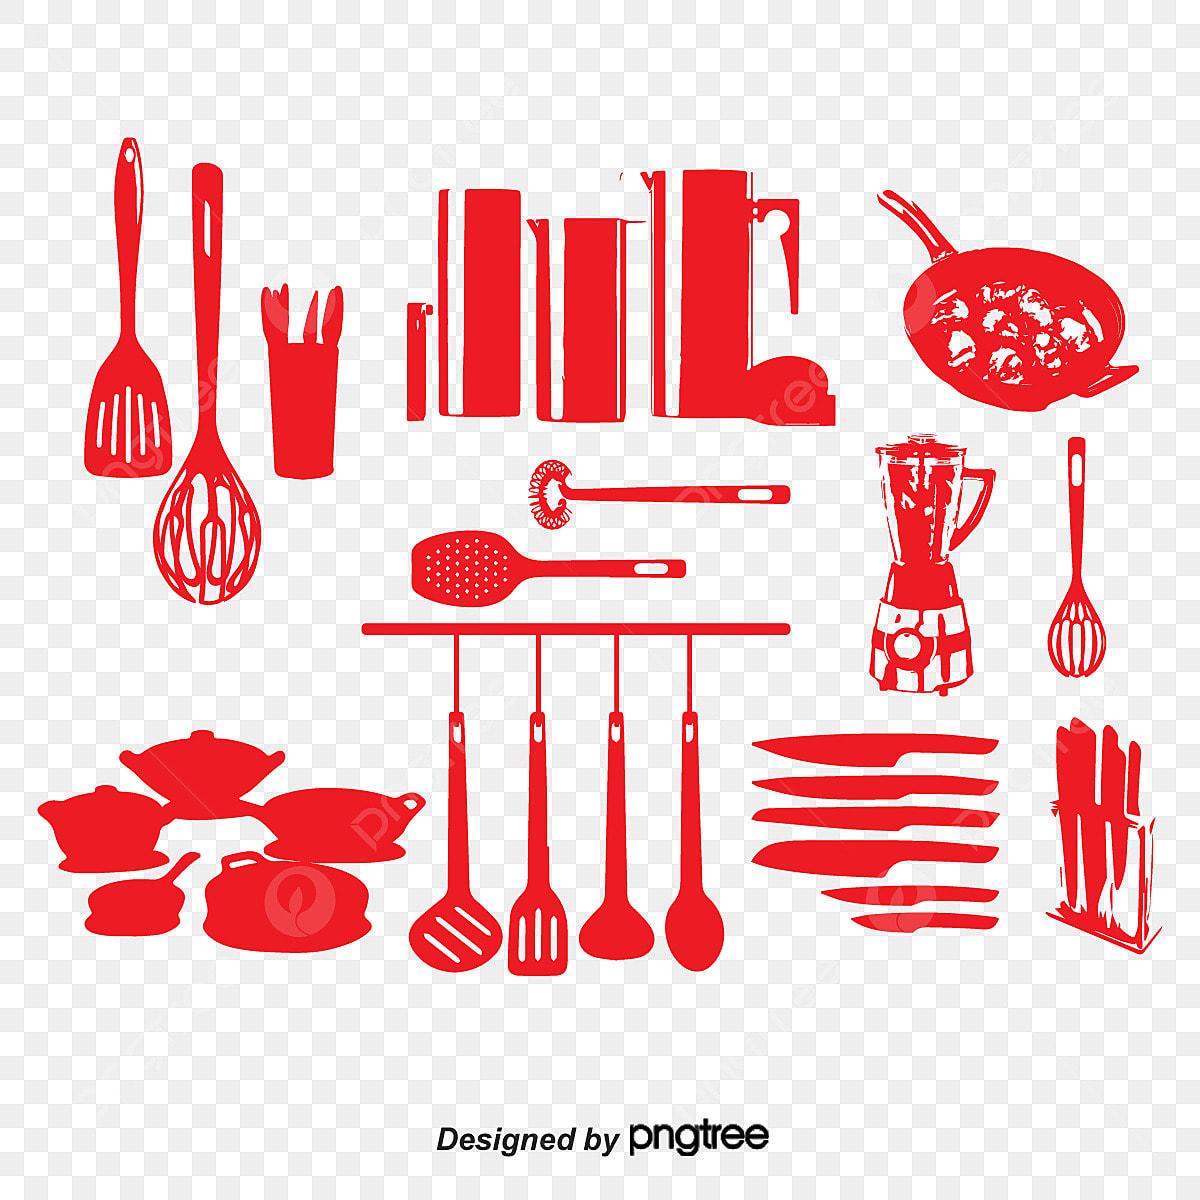 Utensilios De Cocina Silueta Vector Vector Utensilios De Cocina